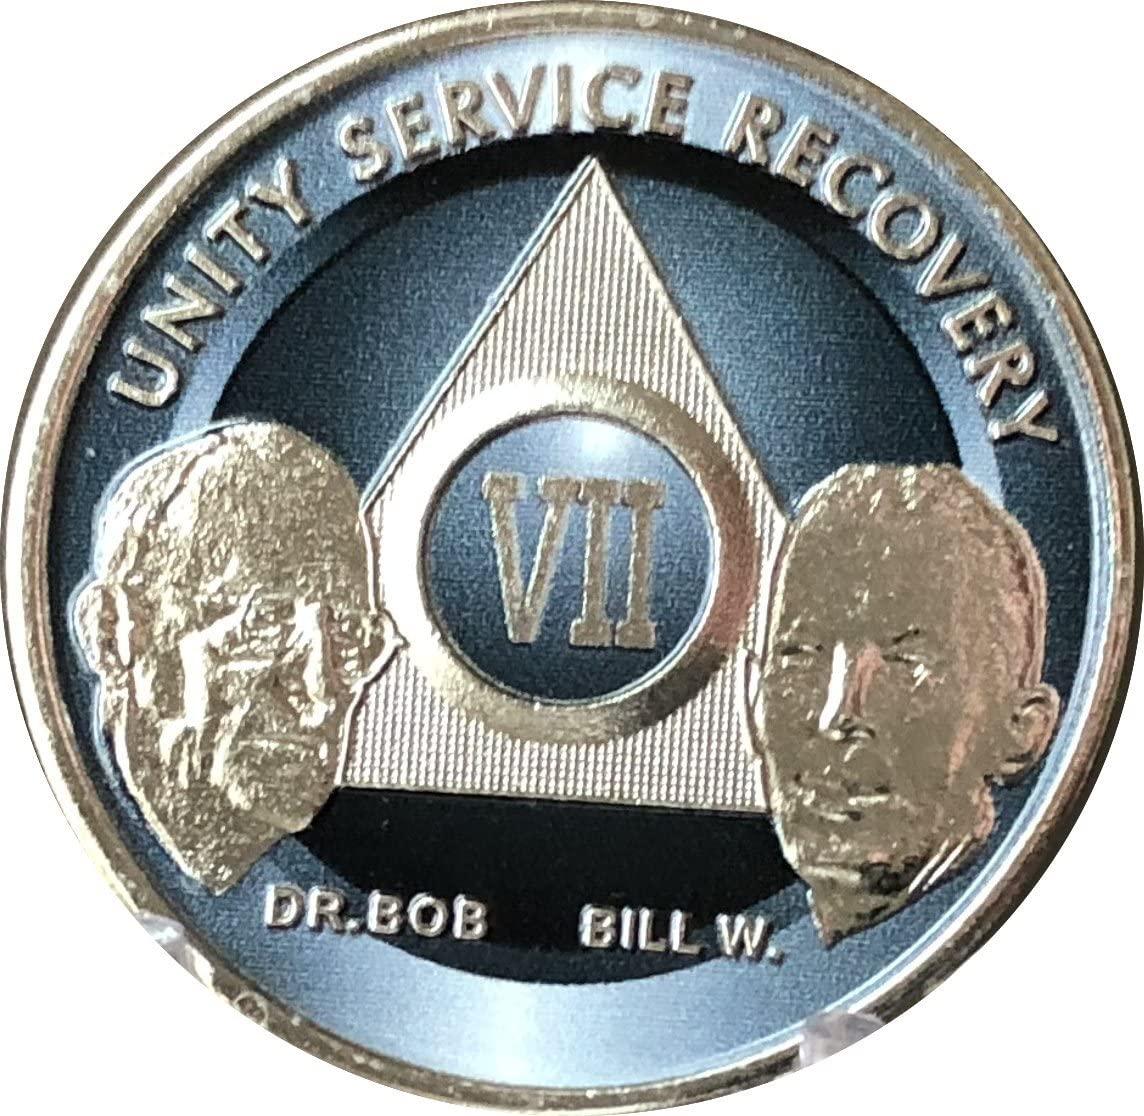 7 Year AA Founders Medallion Titanium Nickel Plated Anniversary Chip VII